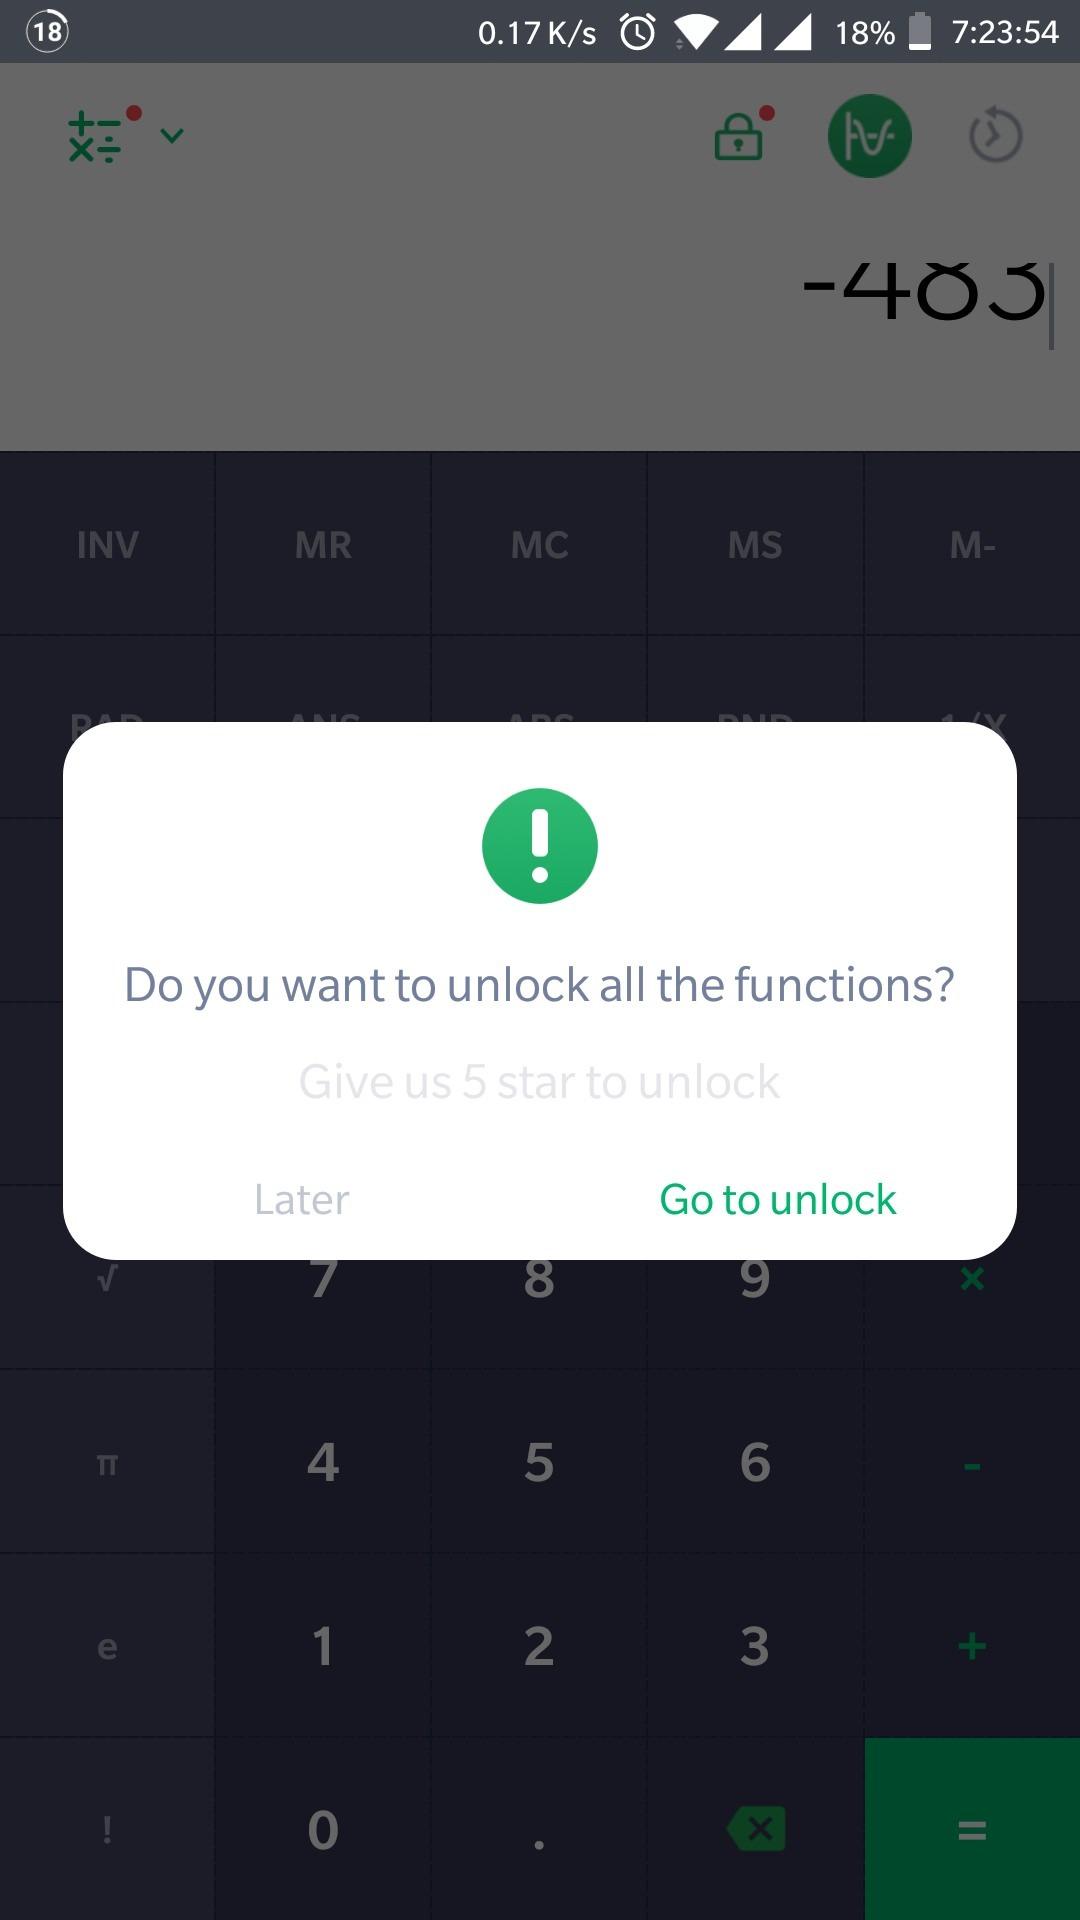 Alcatel rekenmachine-app vereist positieve review vóór gebruik